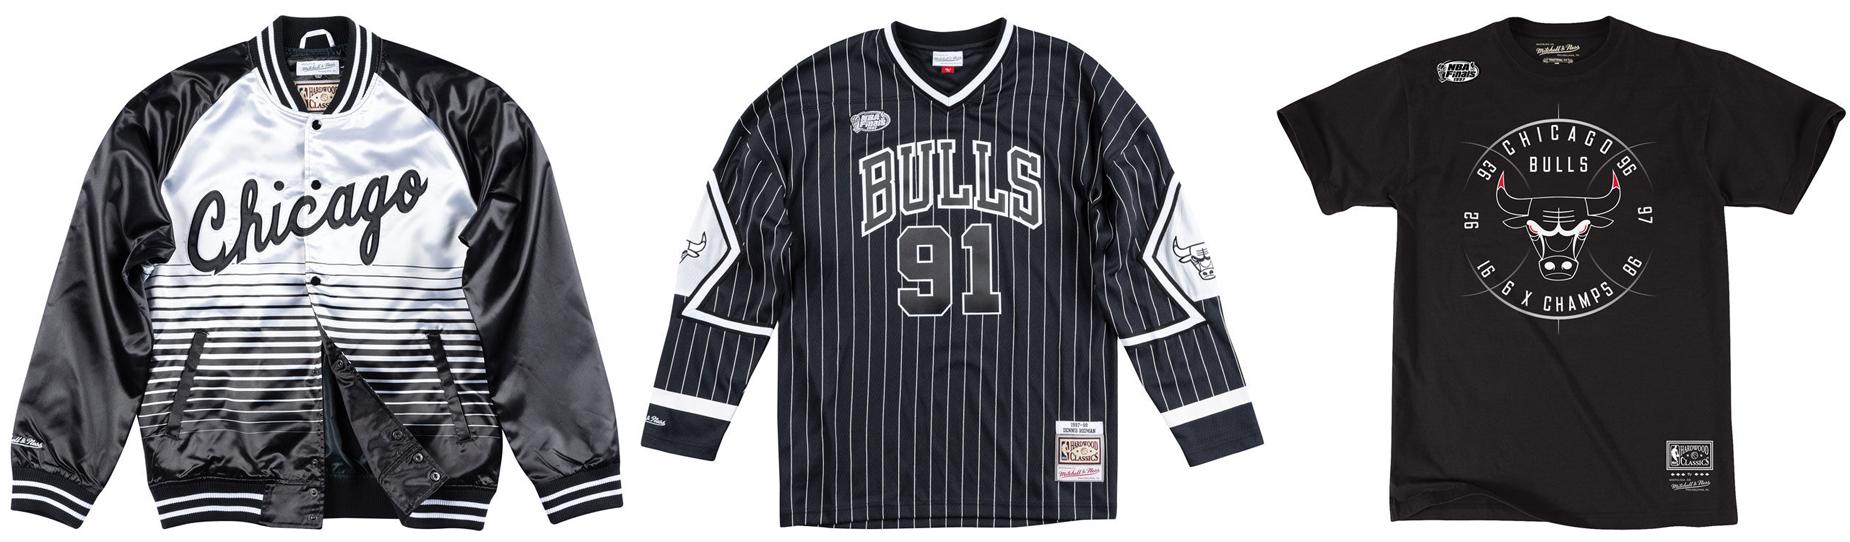 Mitchell /& Ness Chicago Bulls Strapback hat for Jordan 11 Concord